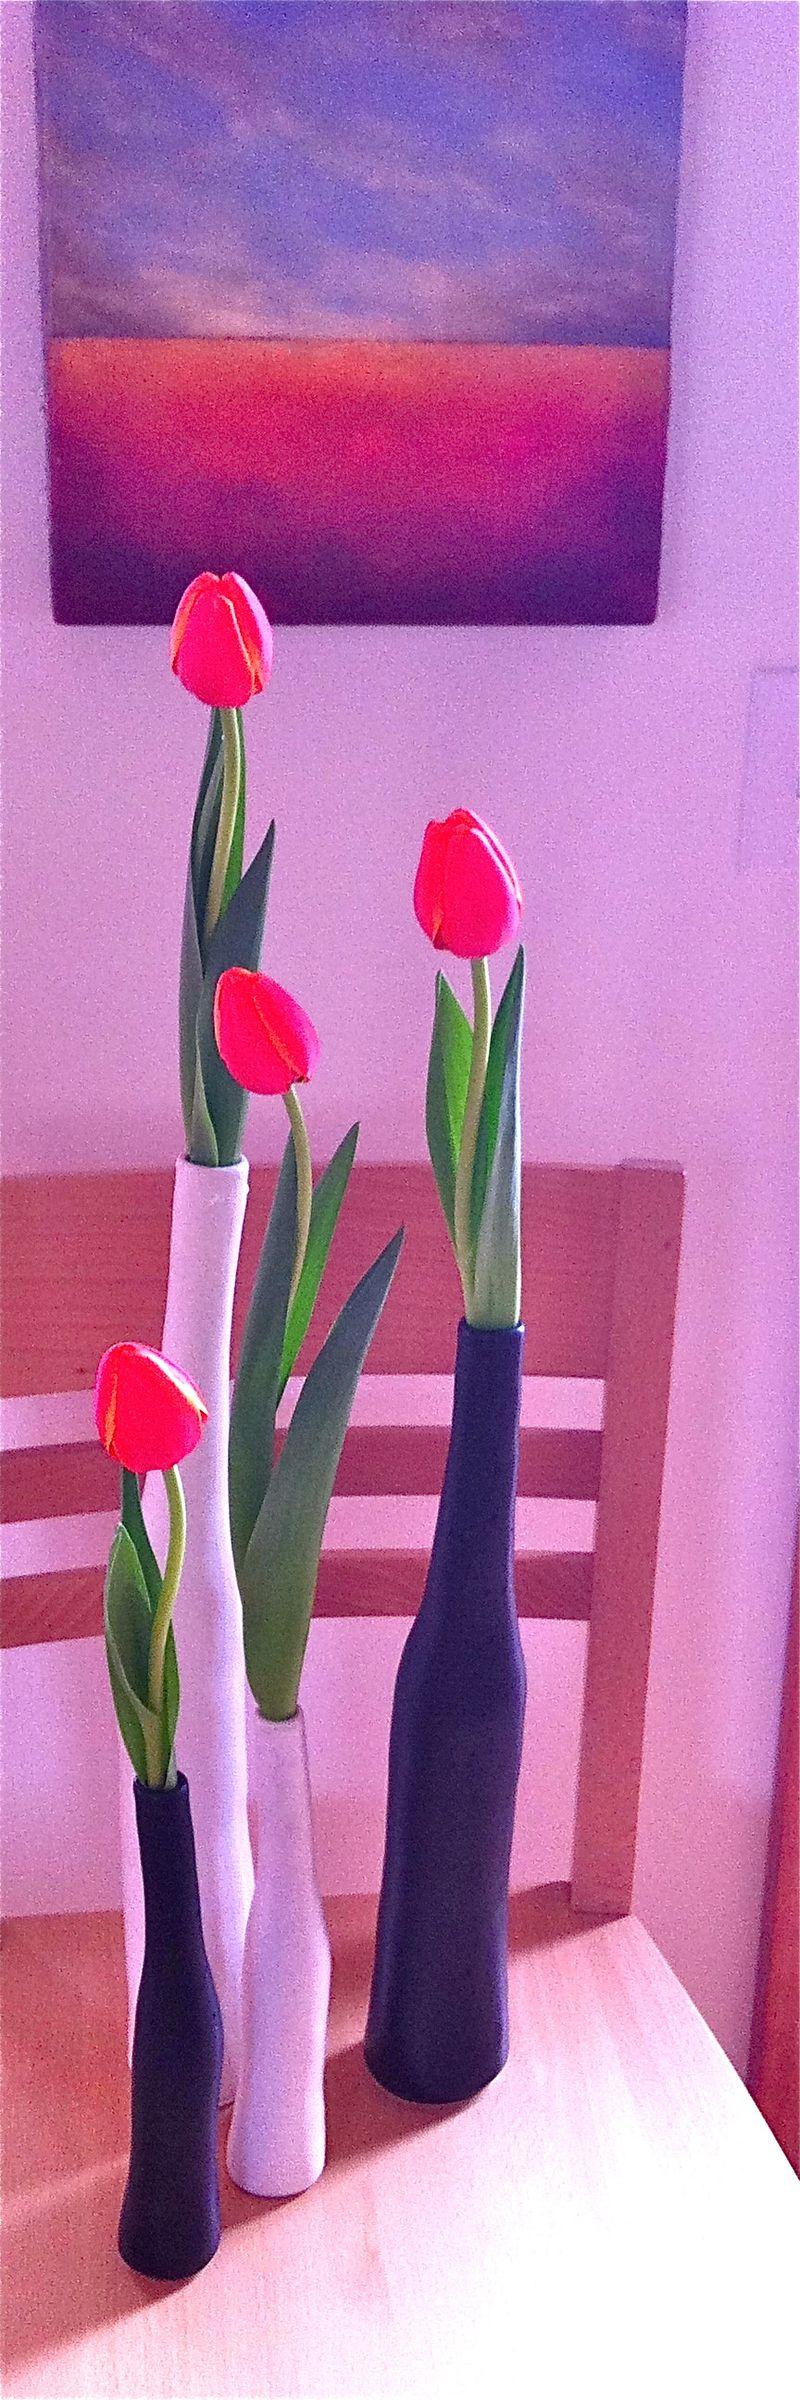 Tulip cartoon